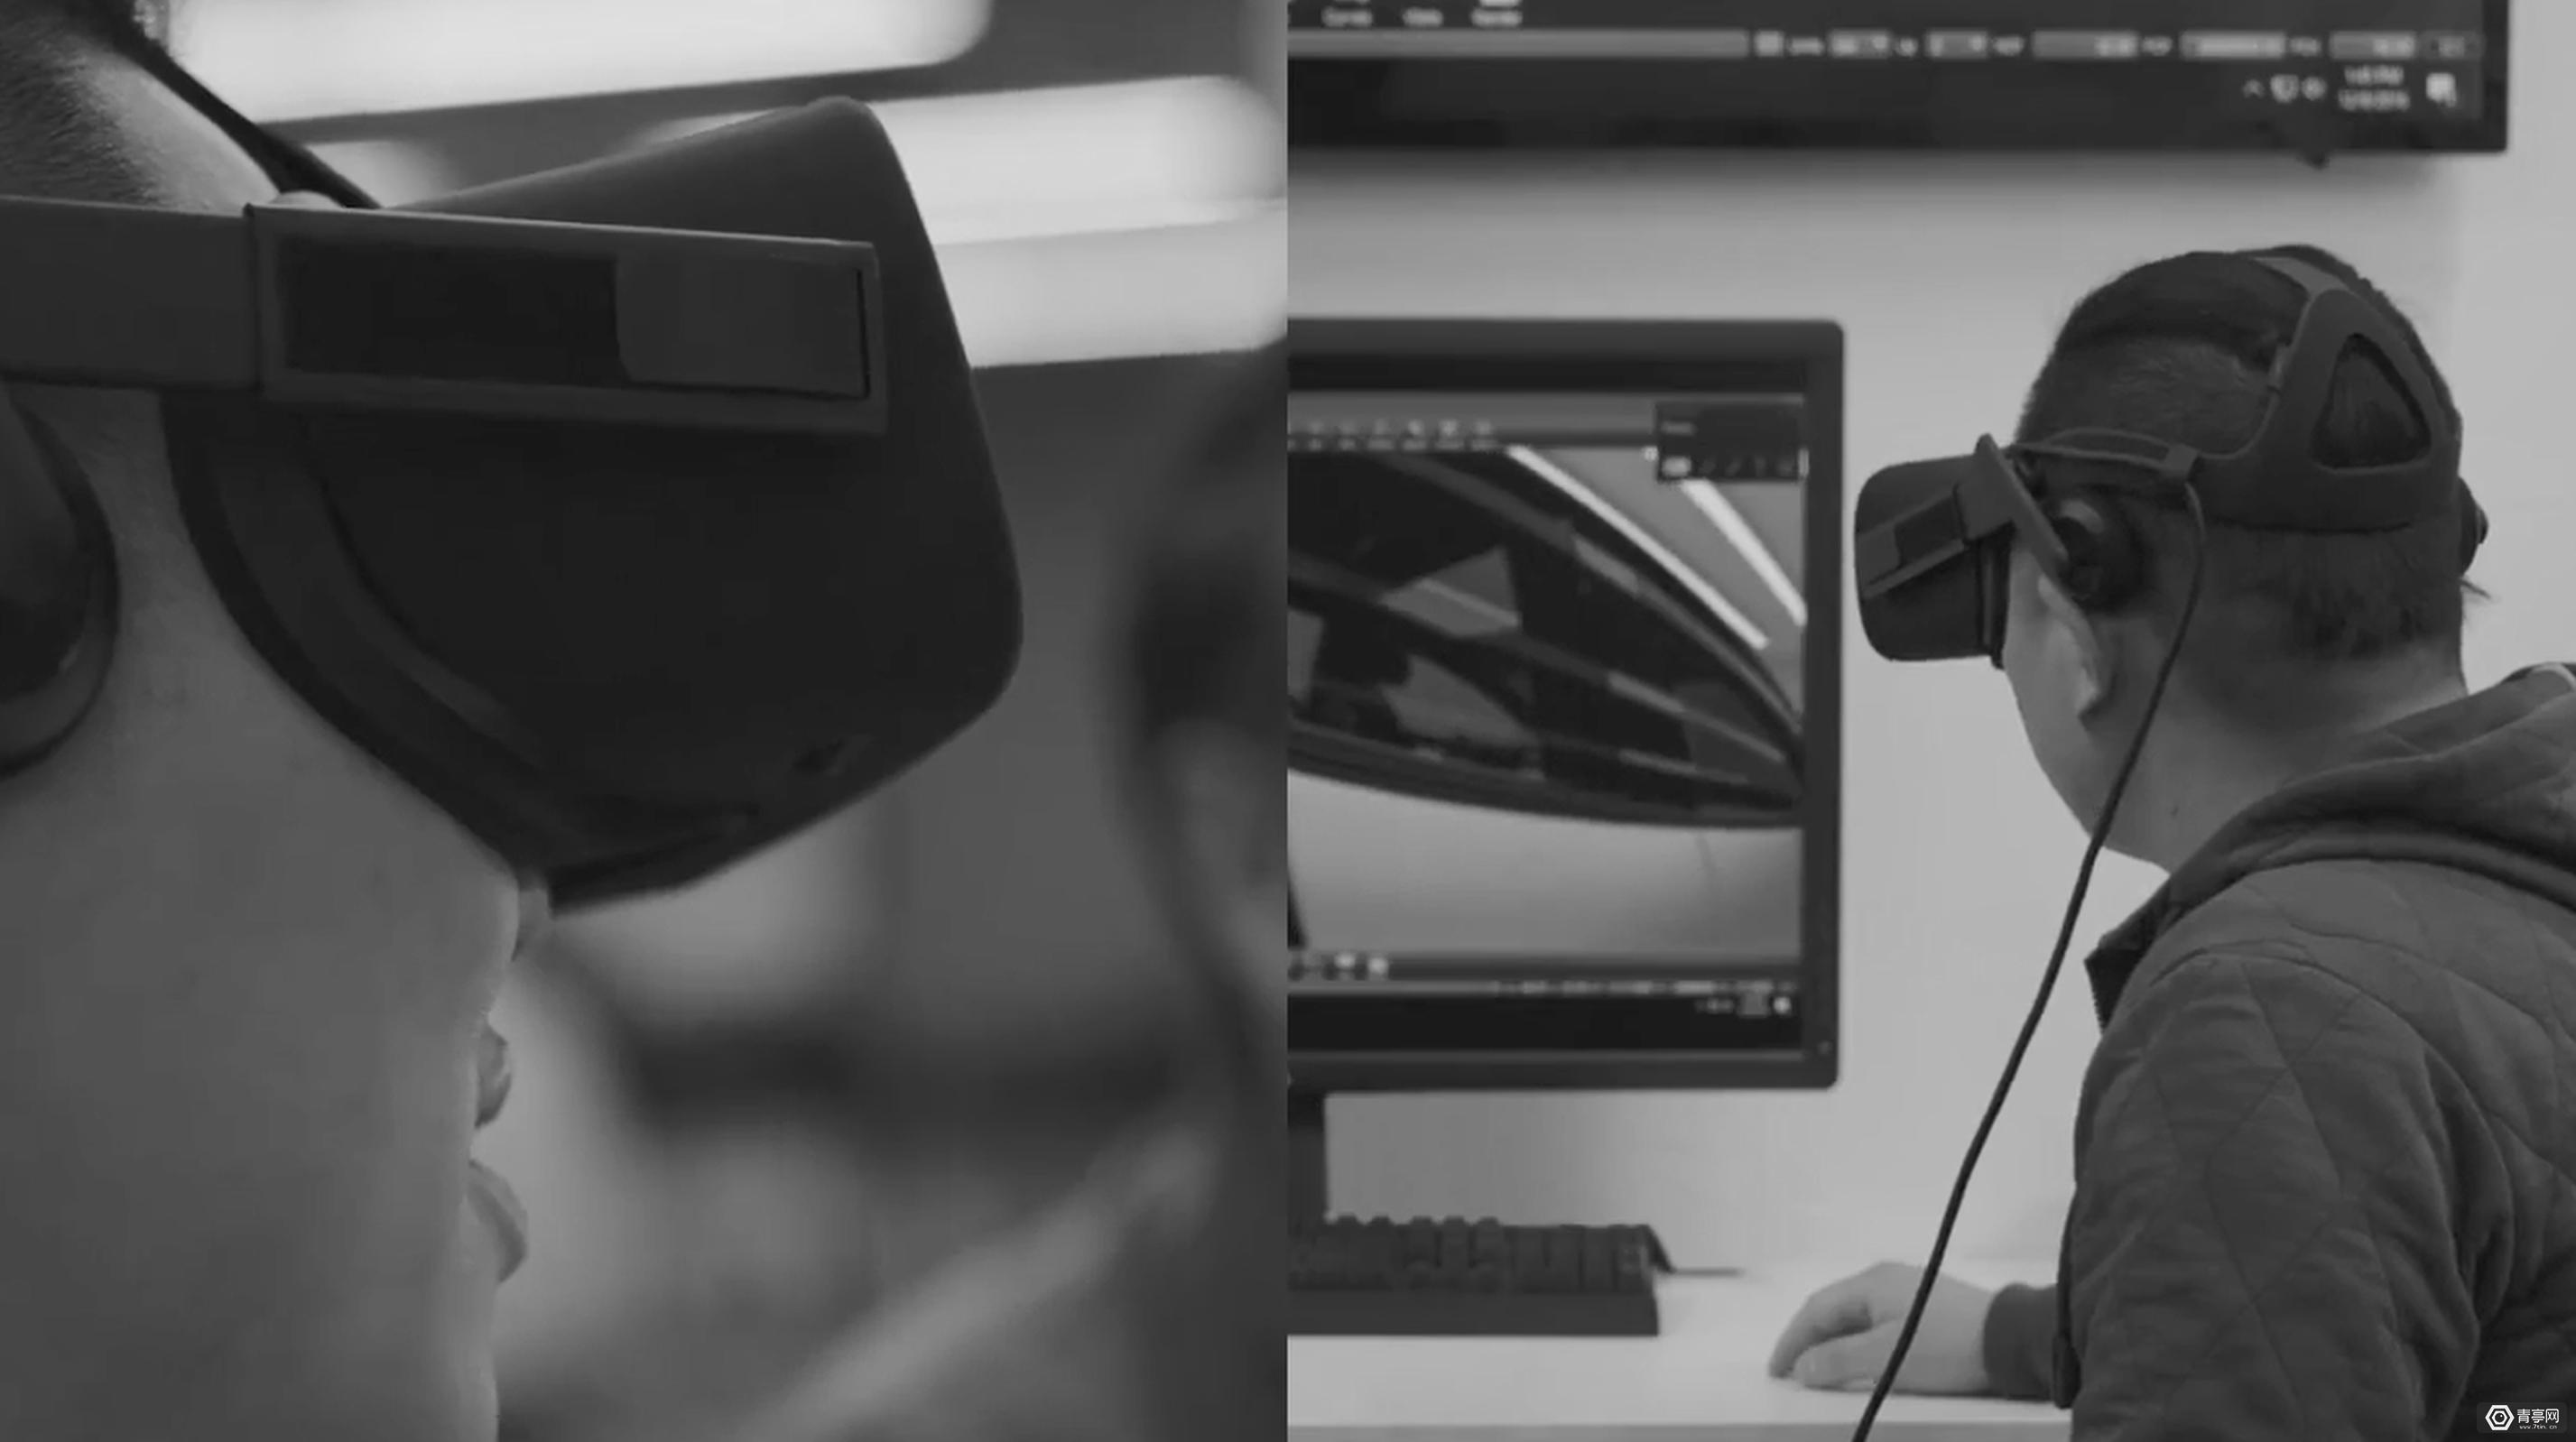 【视频】Oculus VR头盔现身乐视FF91新车宣传片